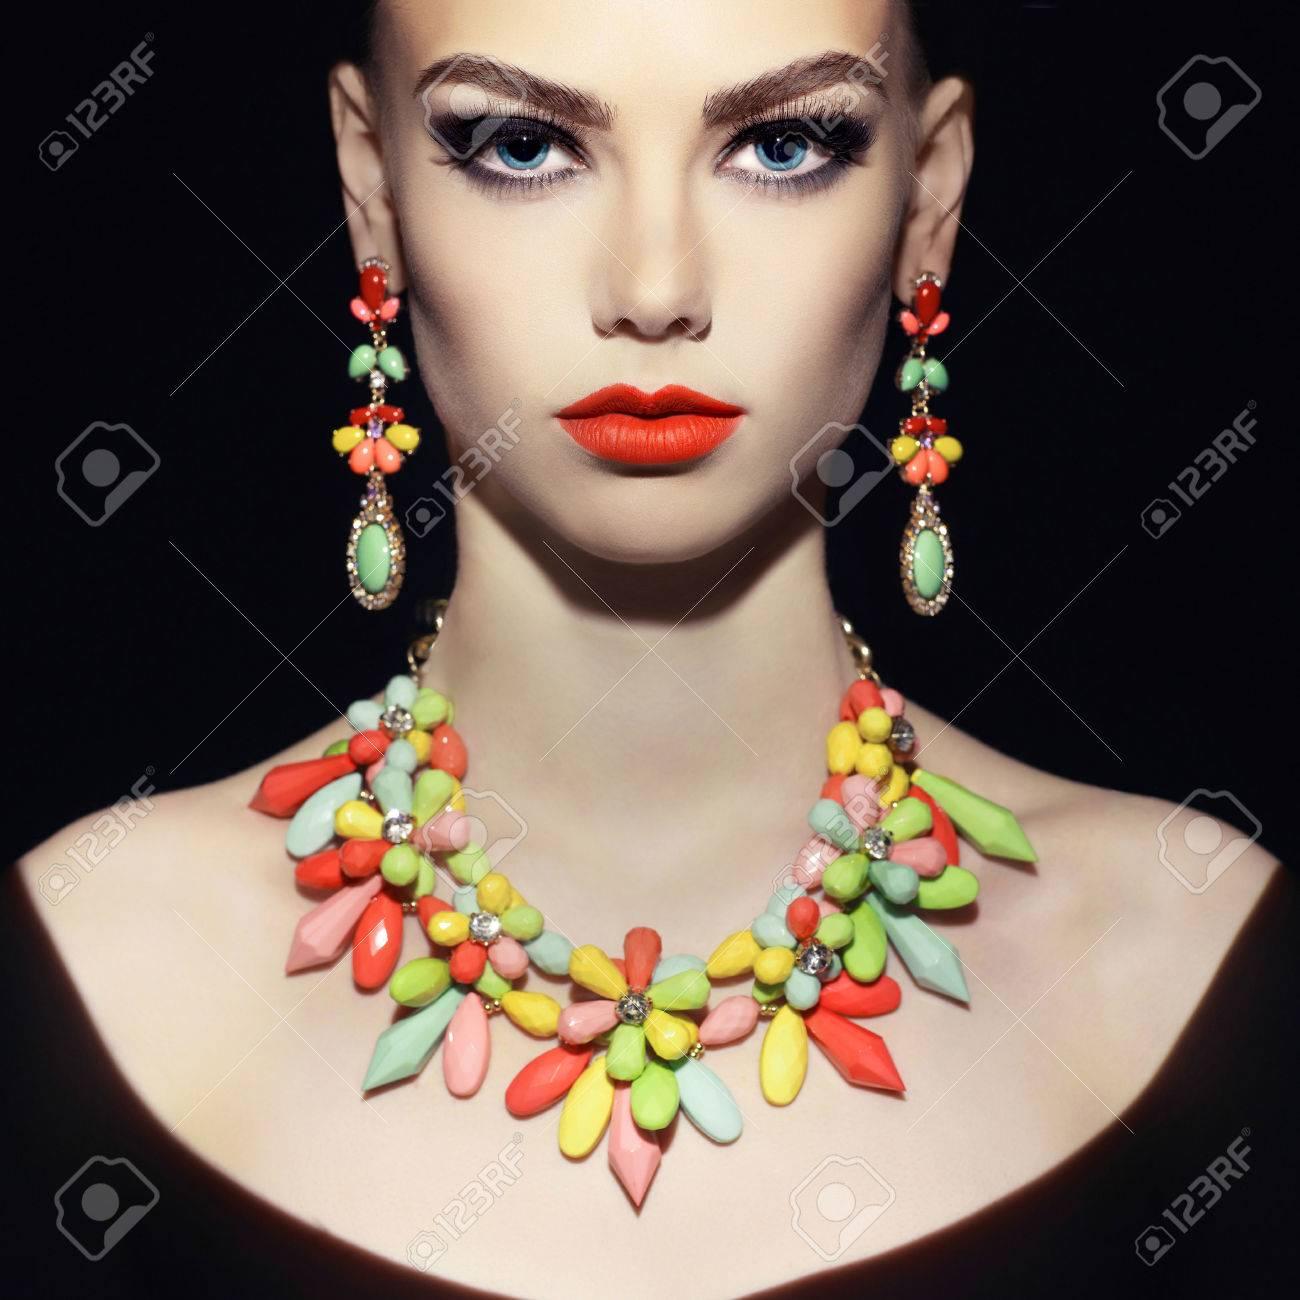 Beautiful young woman with evening make-up. Jewelry and Beauty. Fashion photo Standard-Bild - 38531784